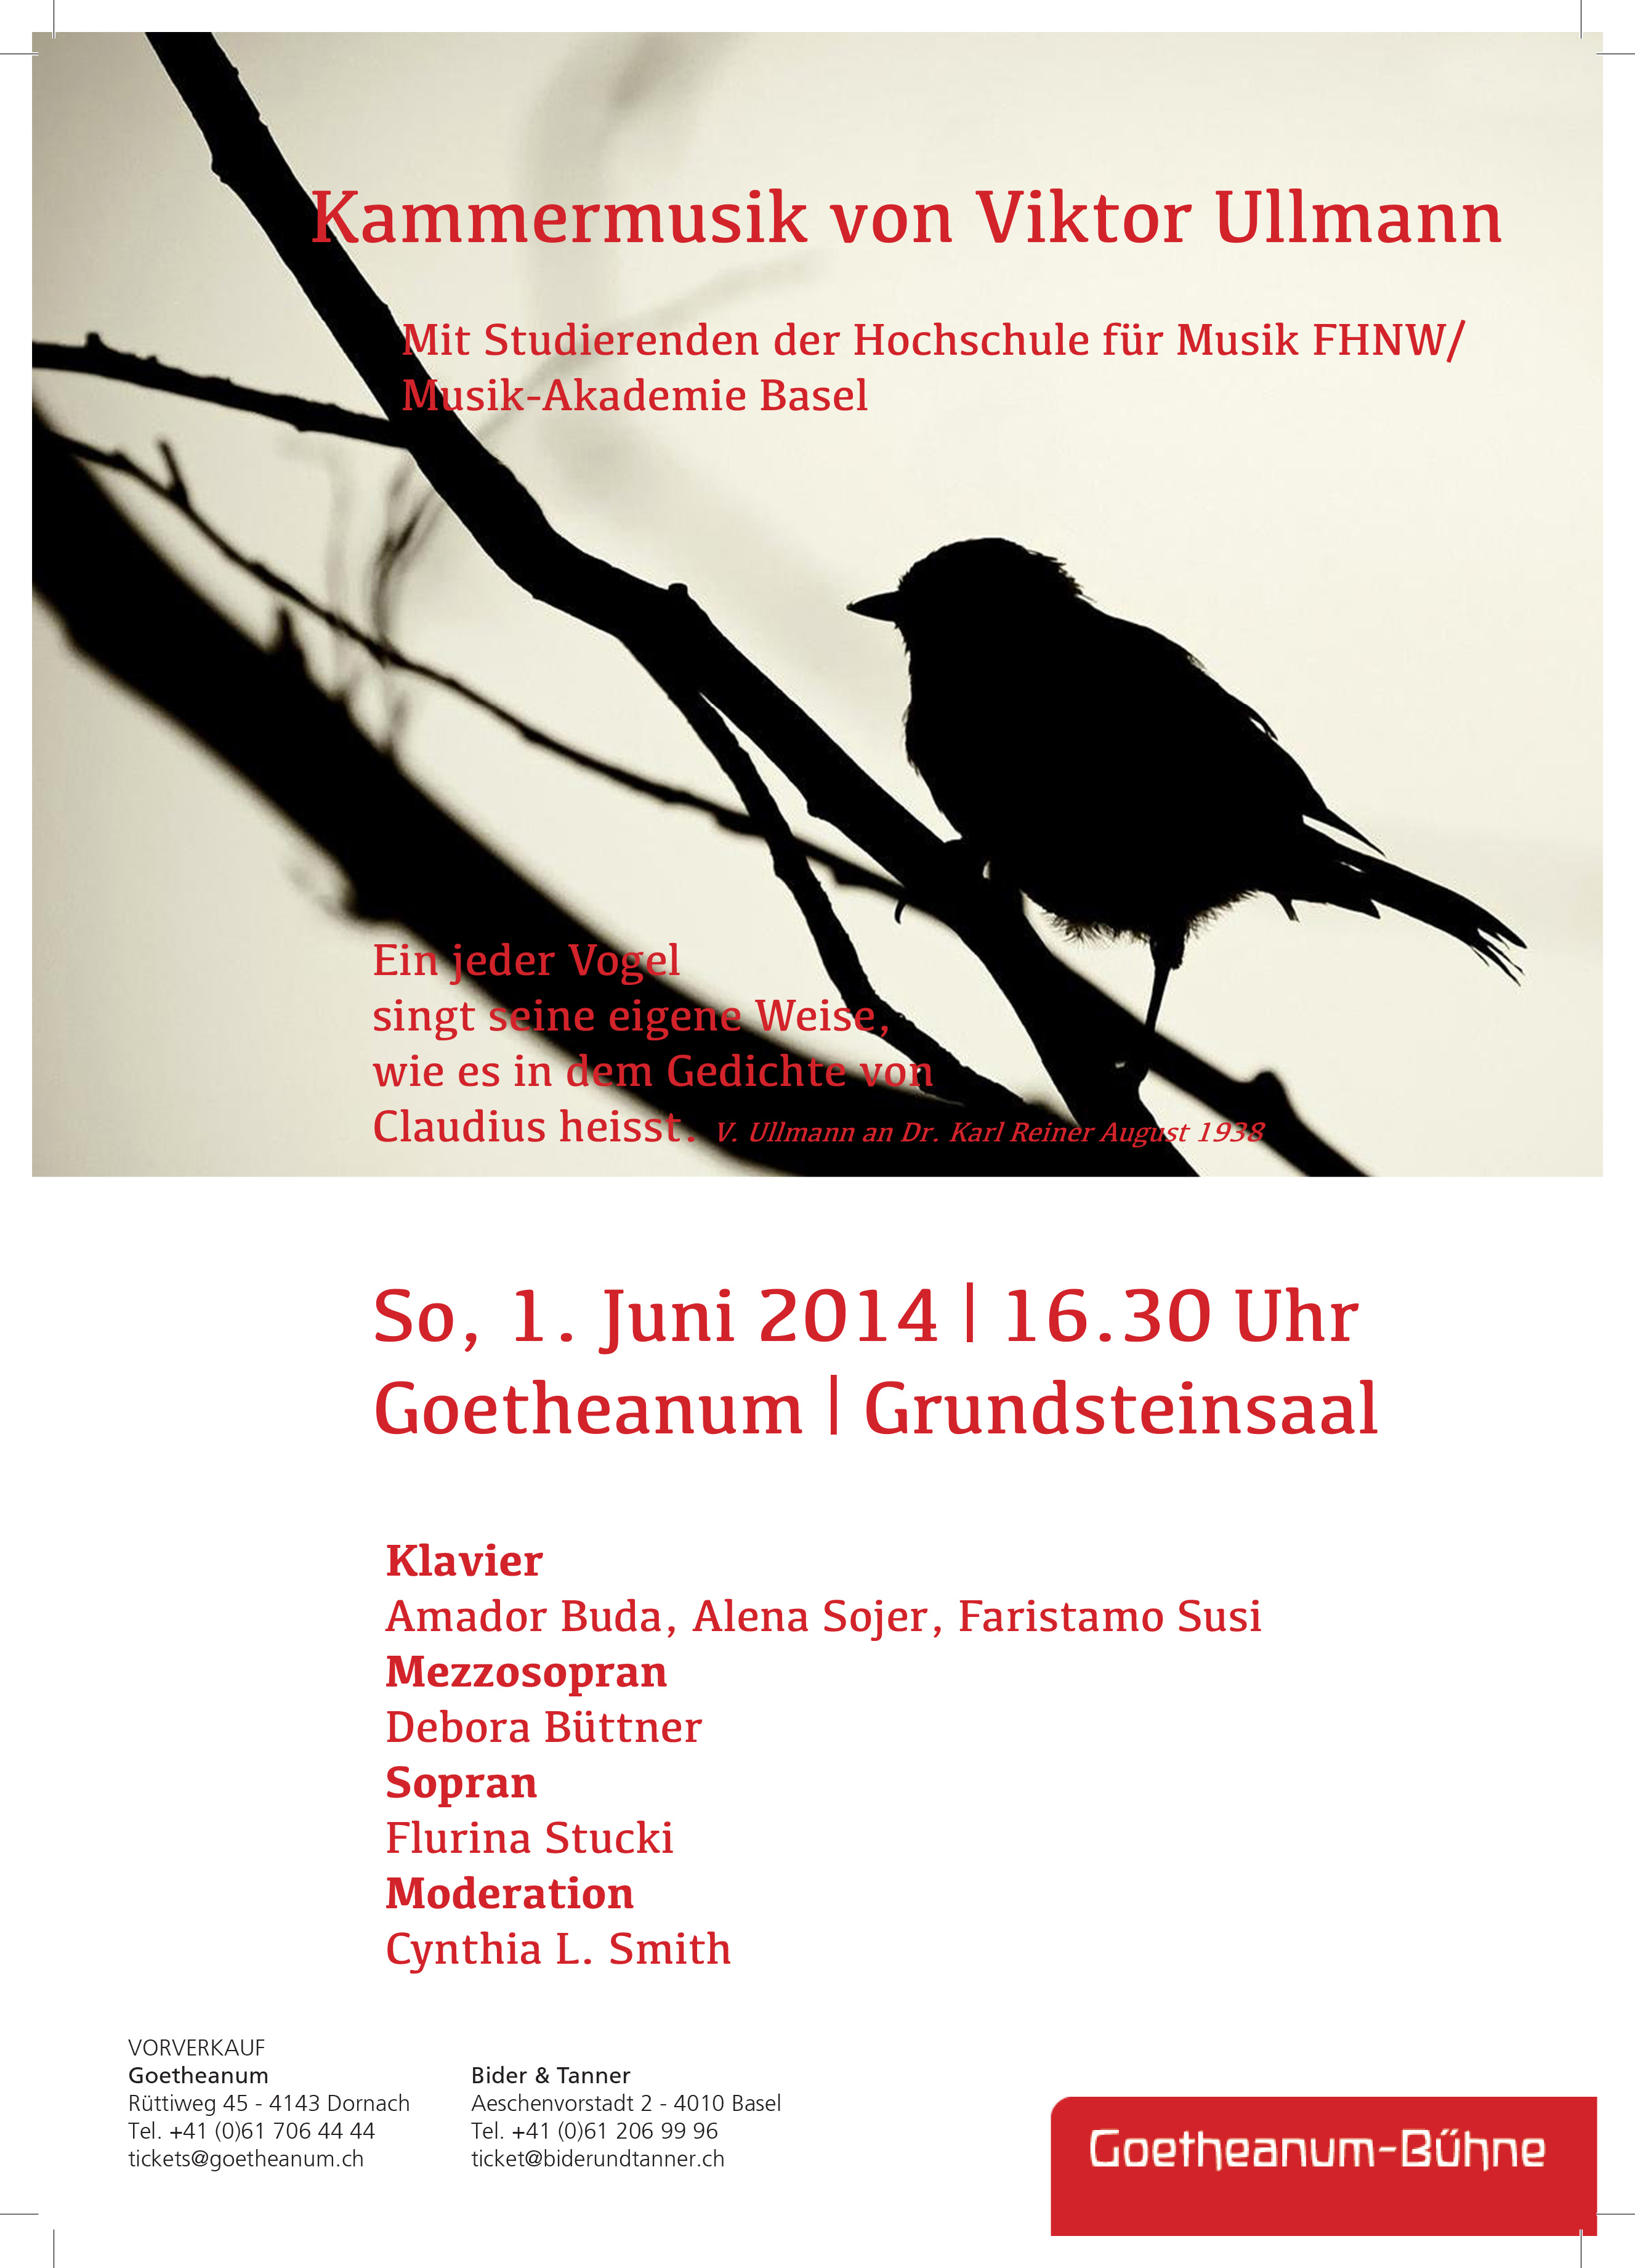 Ullmann Recital at the Goetheanum